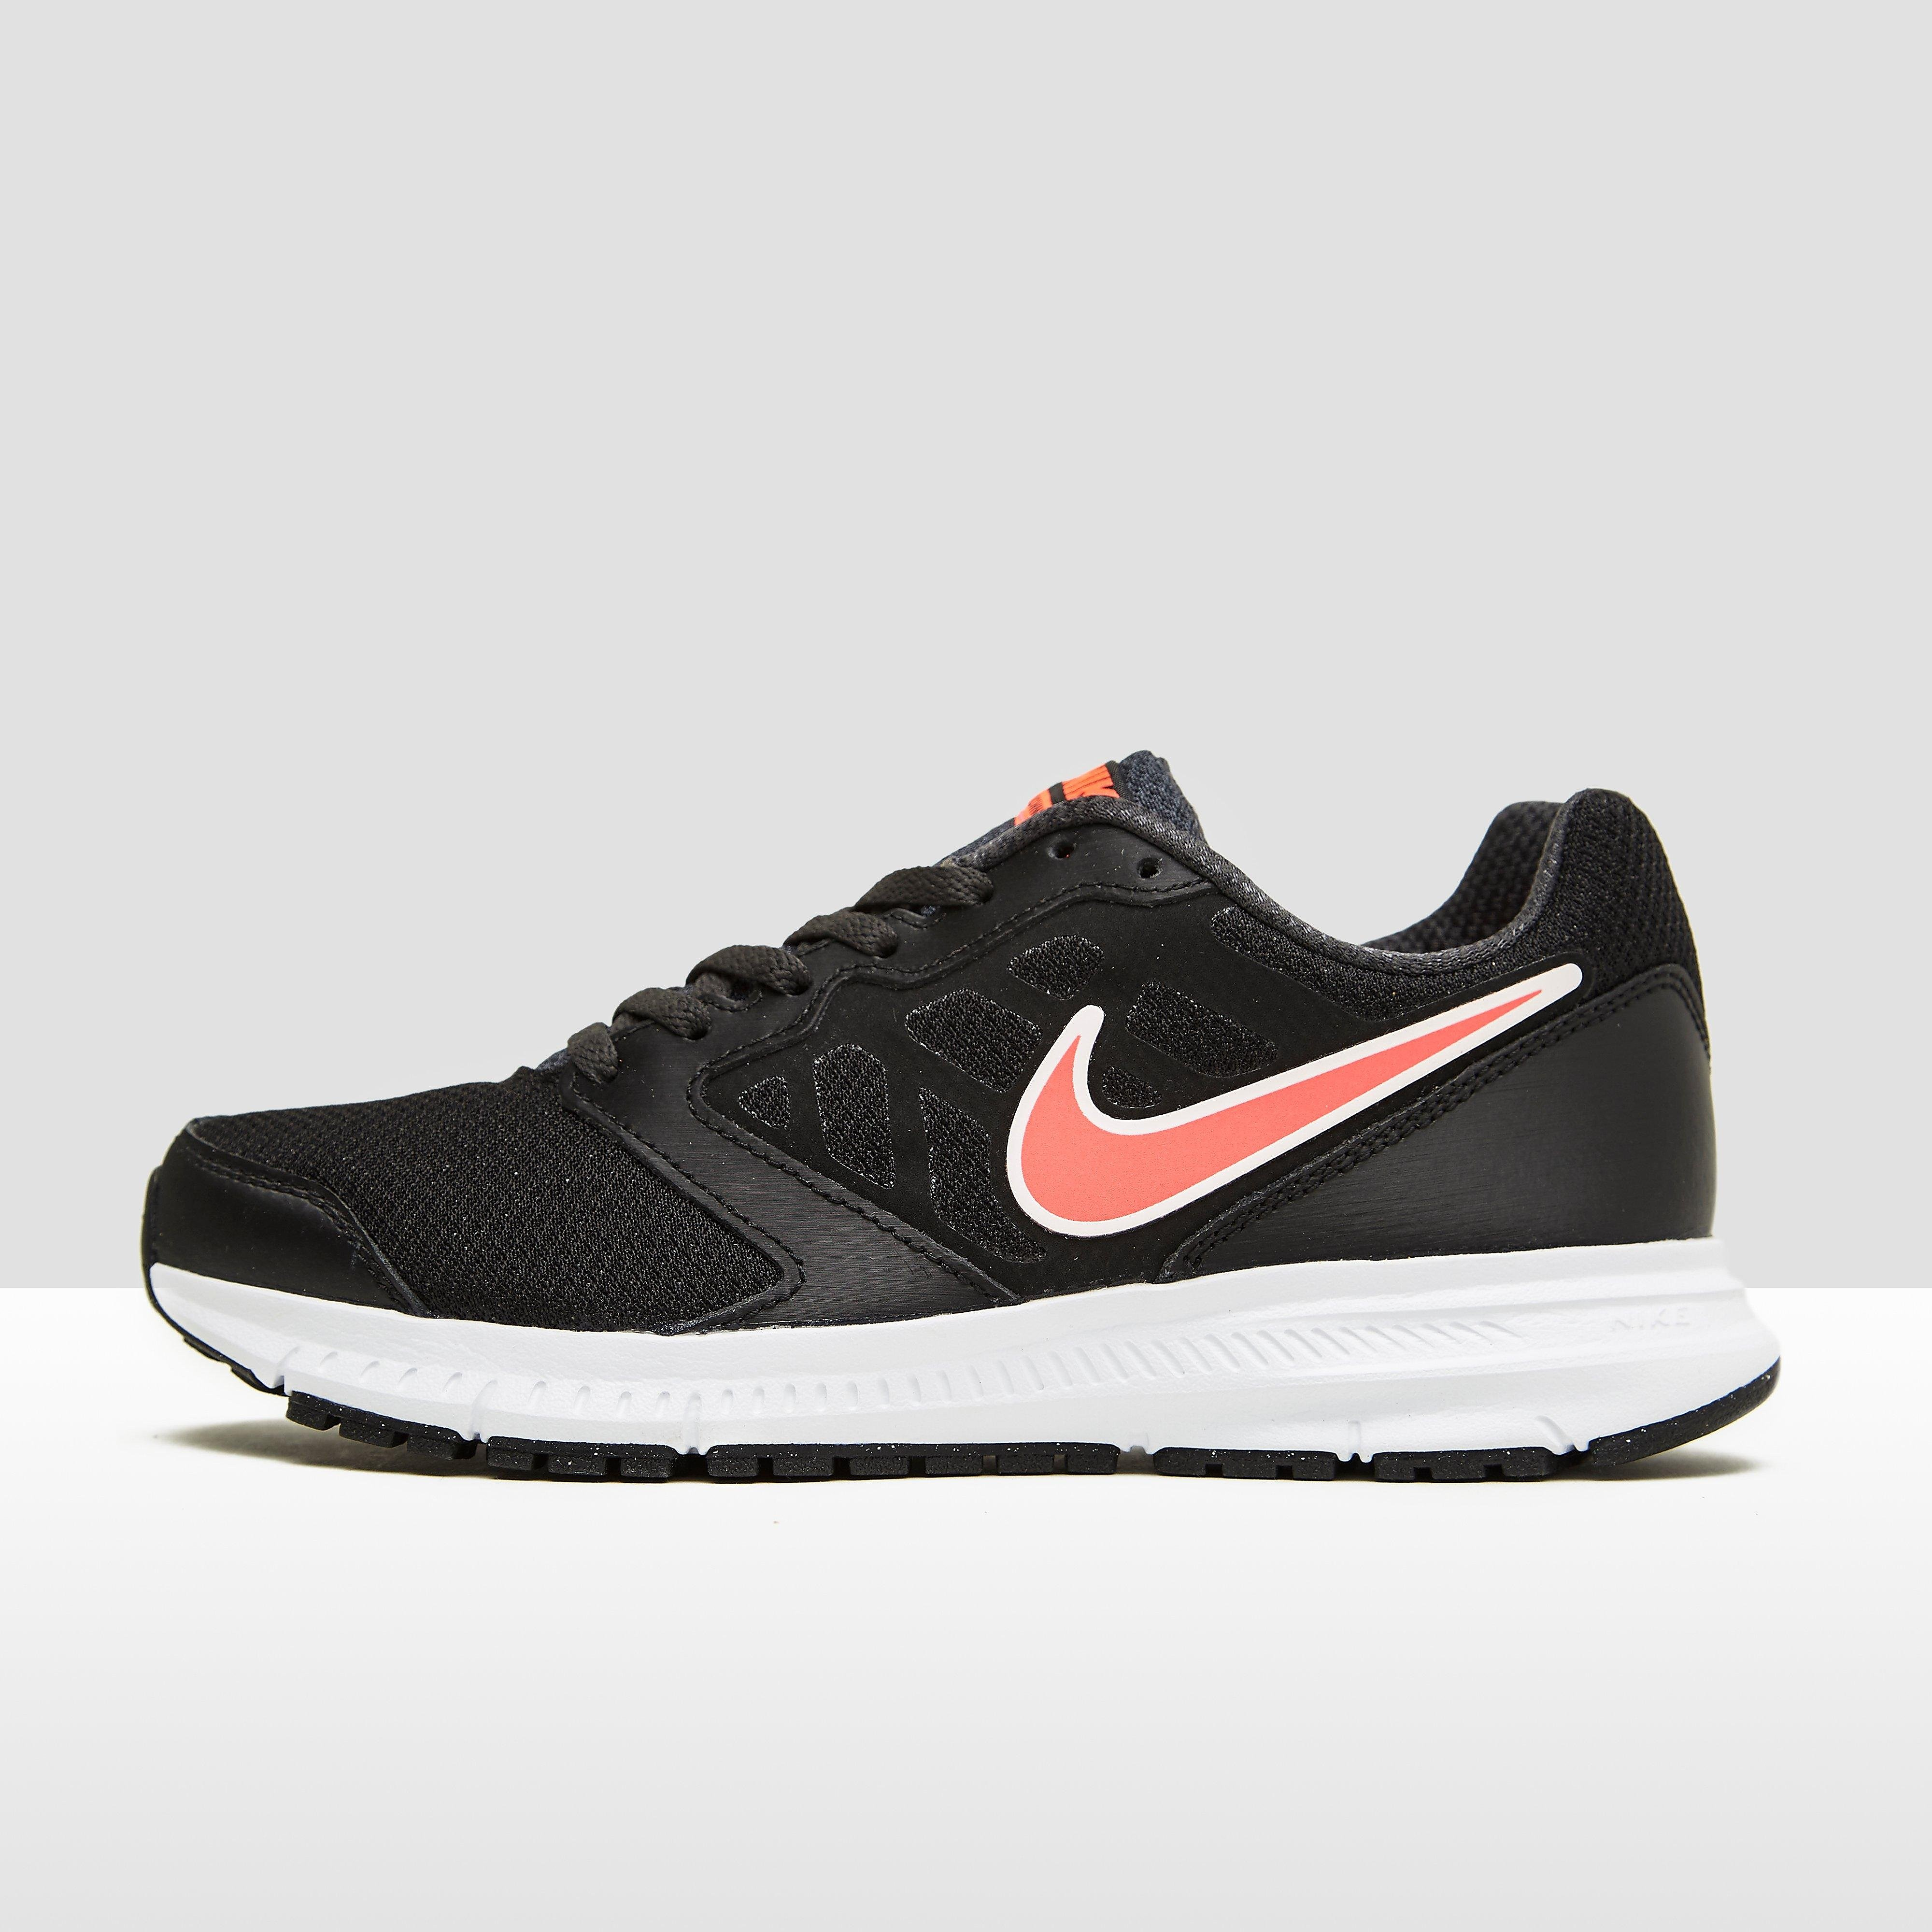 Nike DOWNSHIFTER 6 MSL